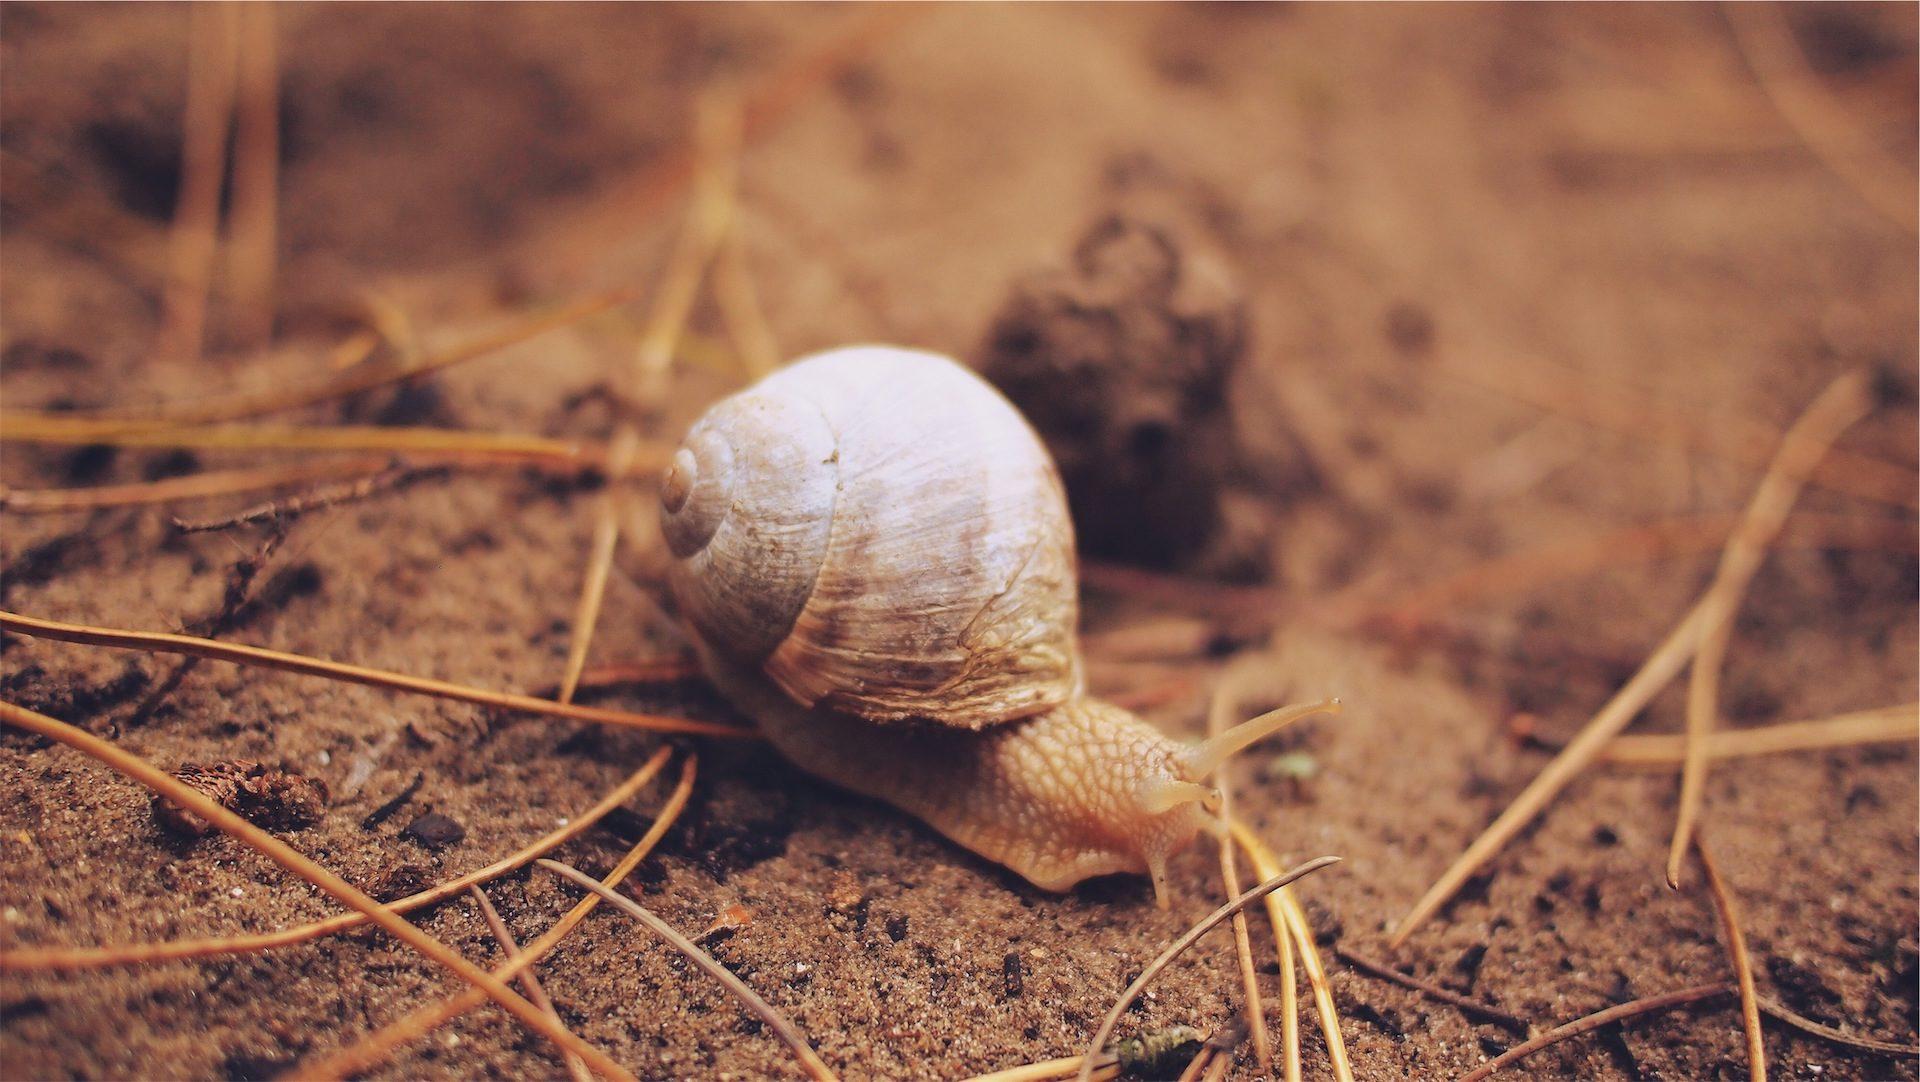 lumaca, Shell, Casa, lento, Terra - Sfondi HD - Professor-falken.com